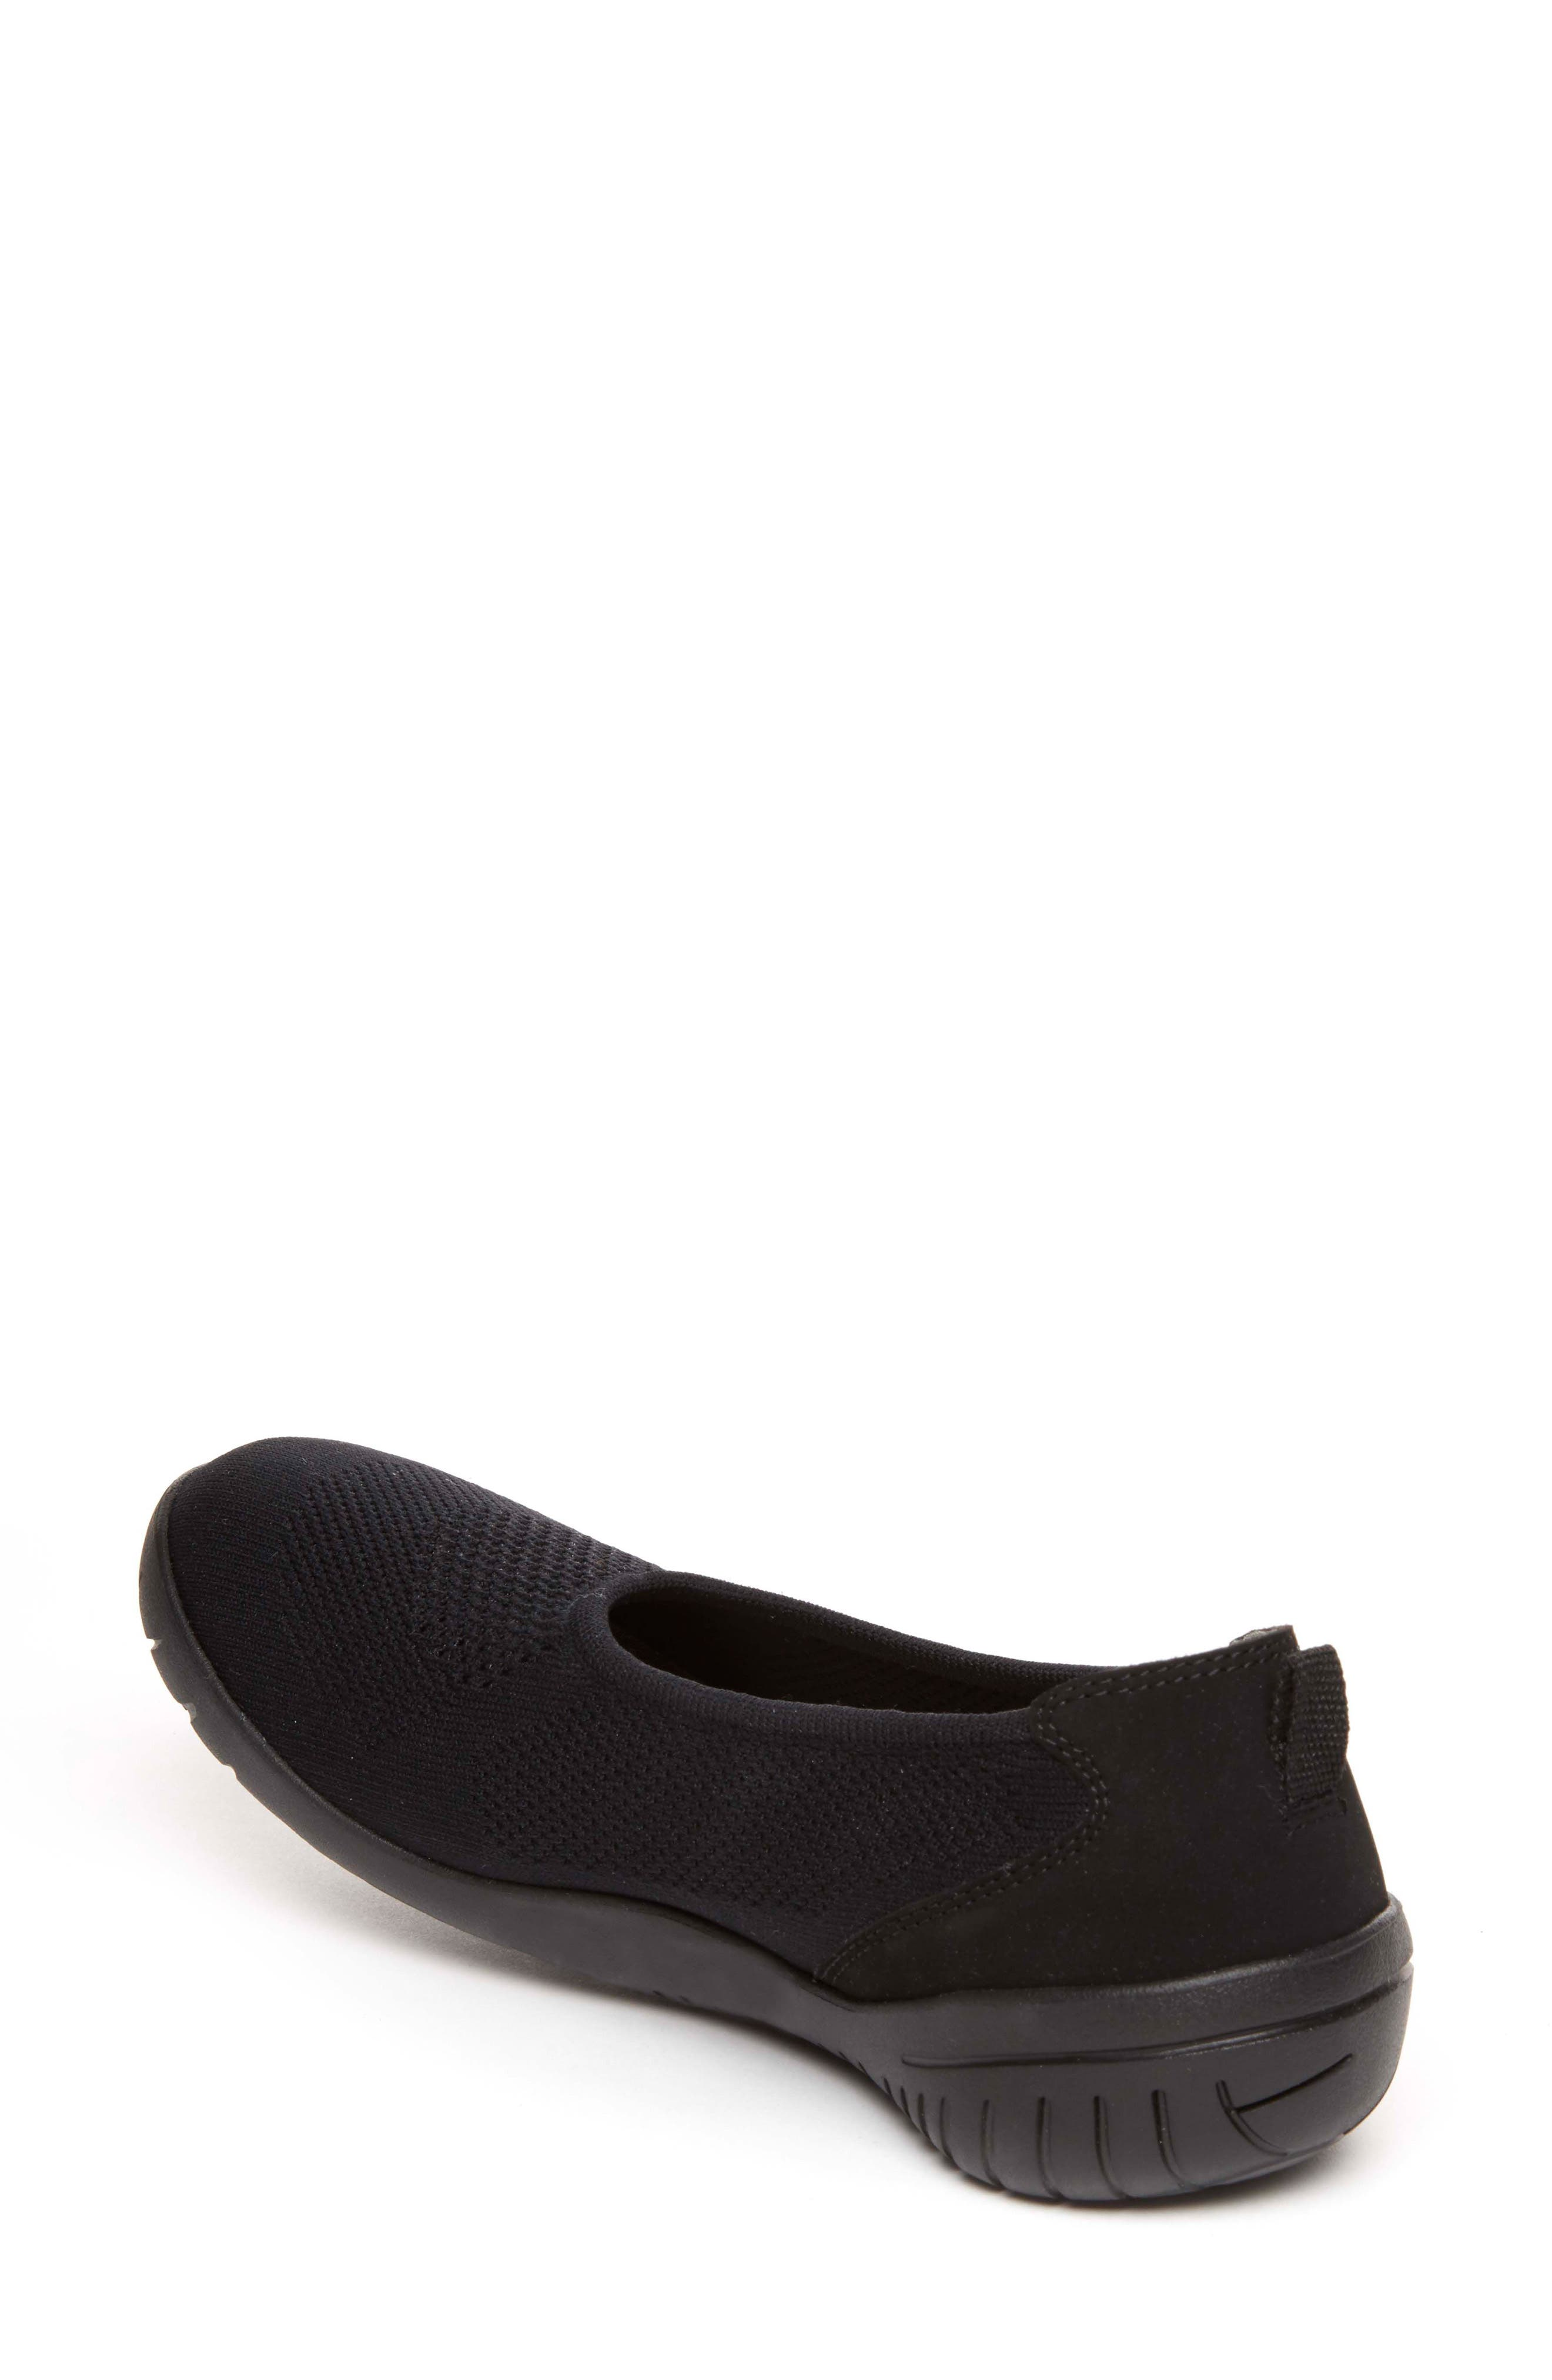 Raelyn Knit Ballet Sneaker,                             Alternate thumbnail 2, color,                             BLACK FABRIC